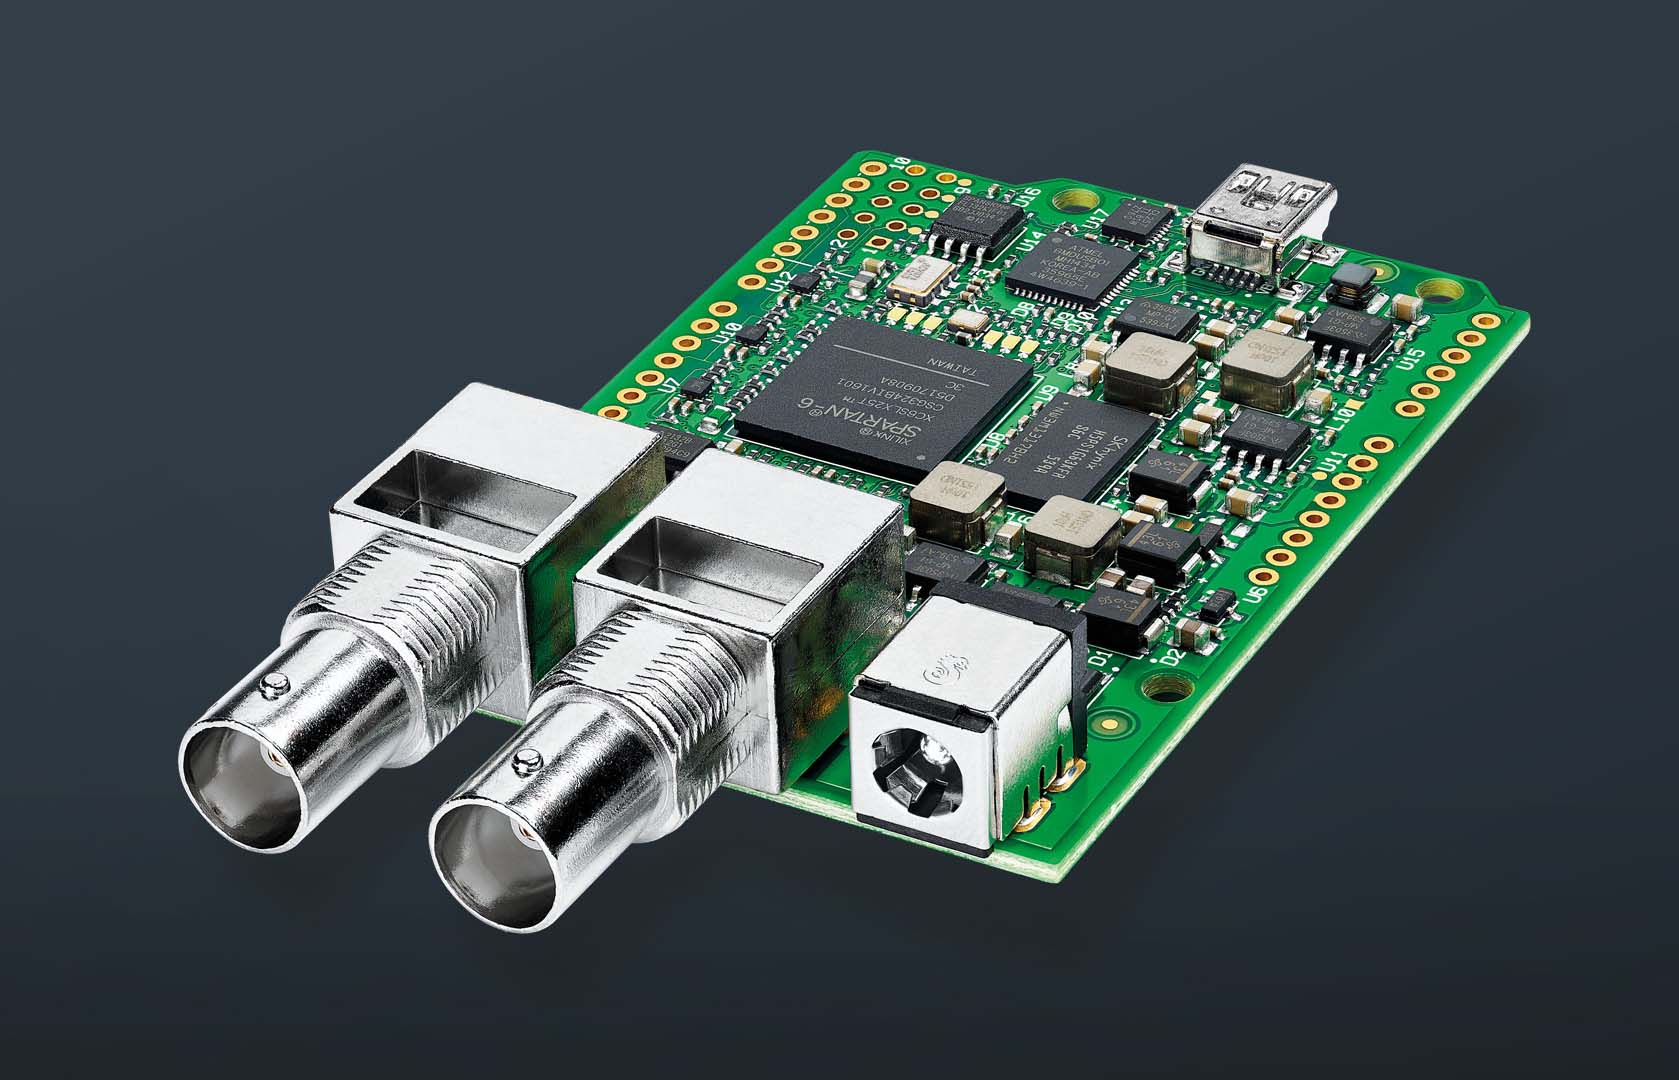 blackmagic-3g-sdi-arduino-shield@2x